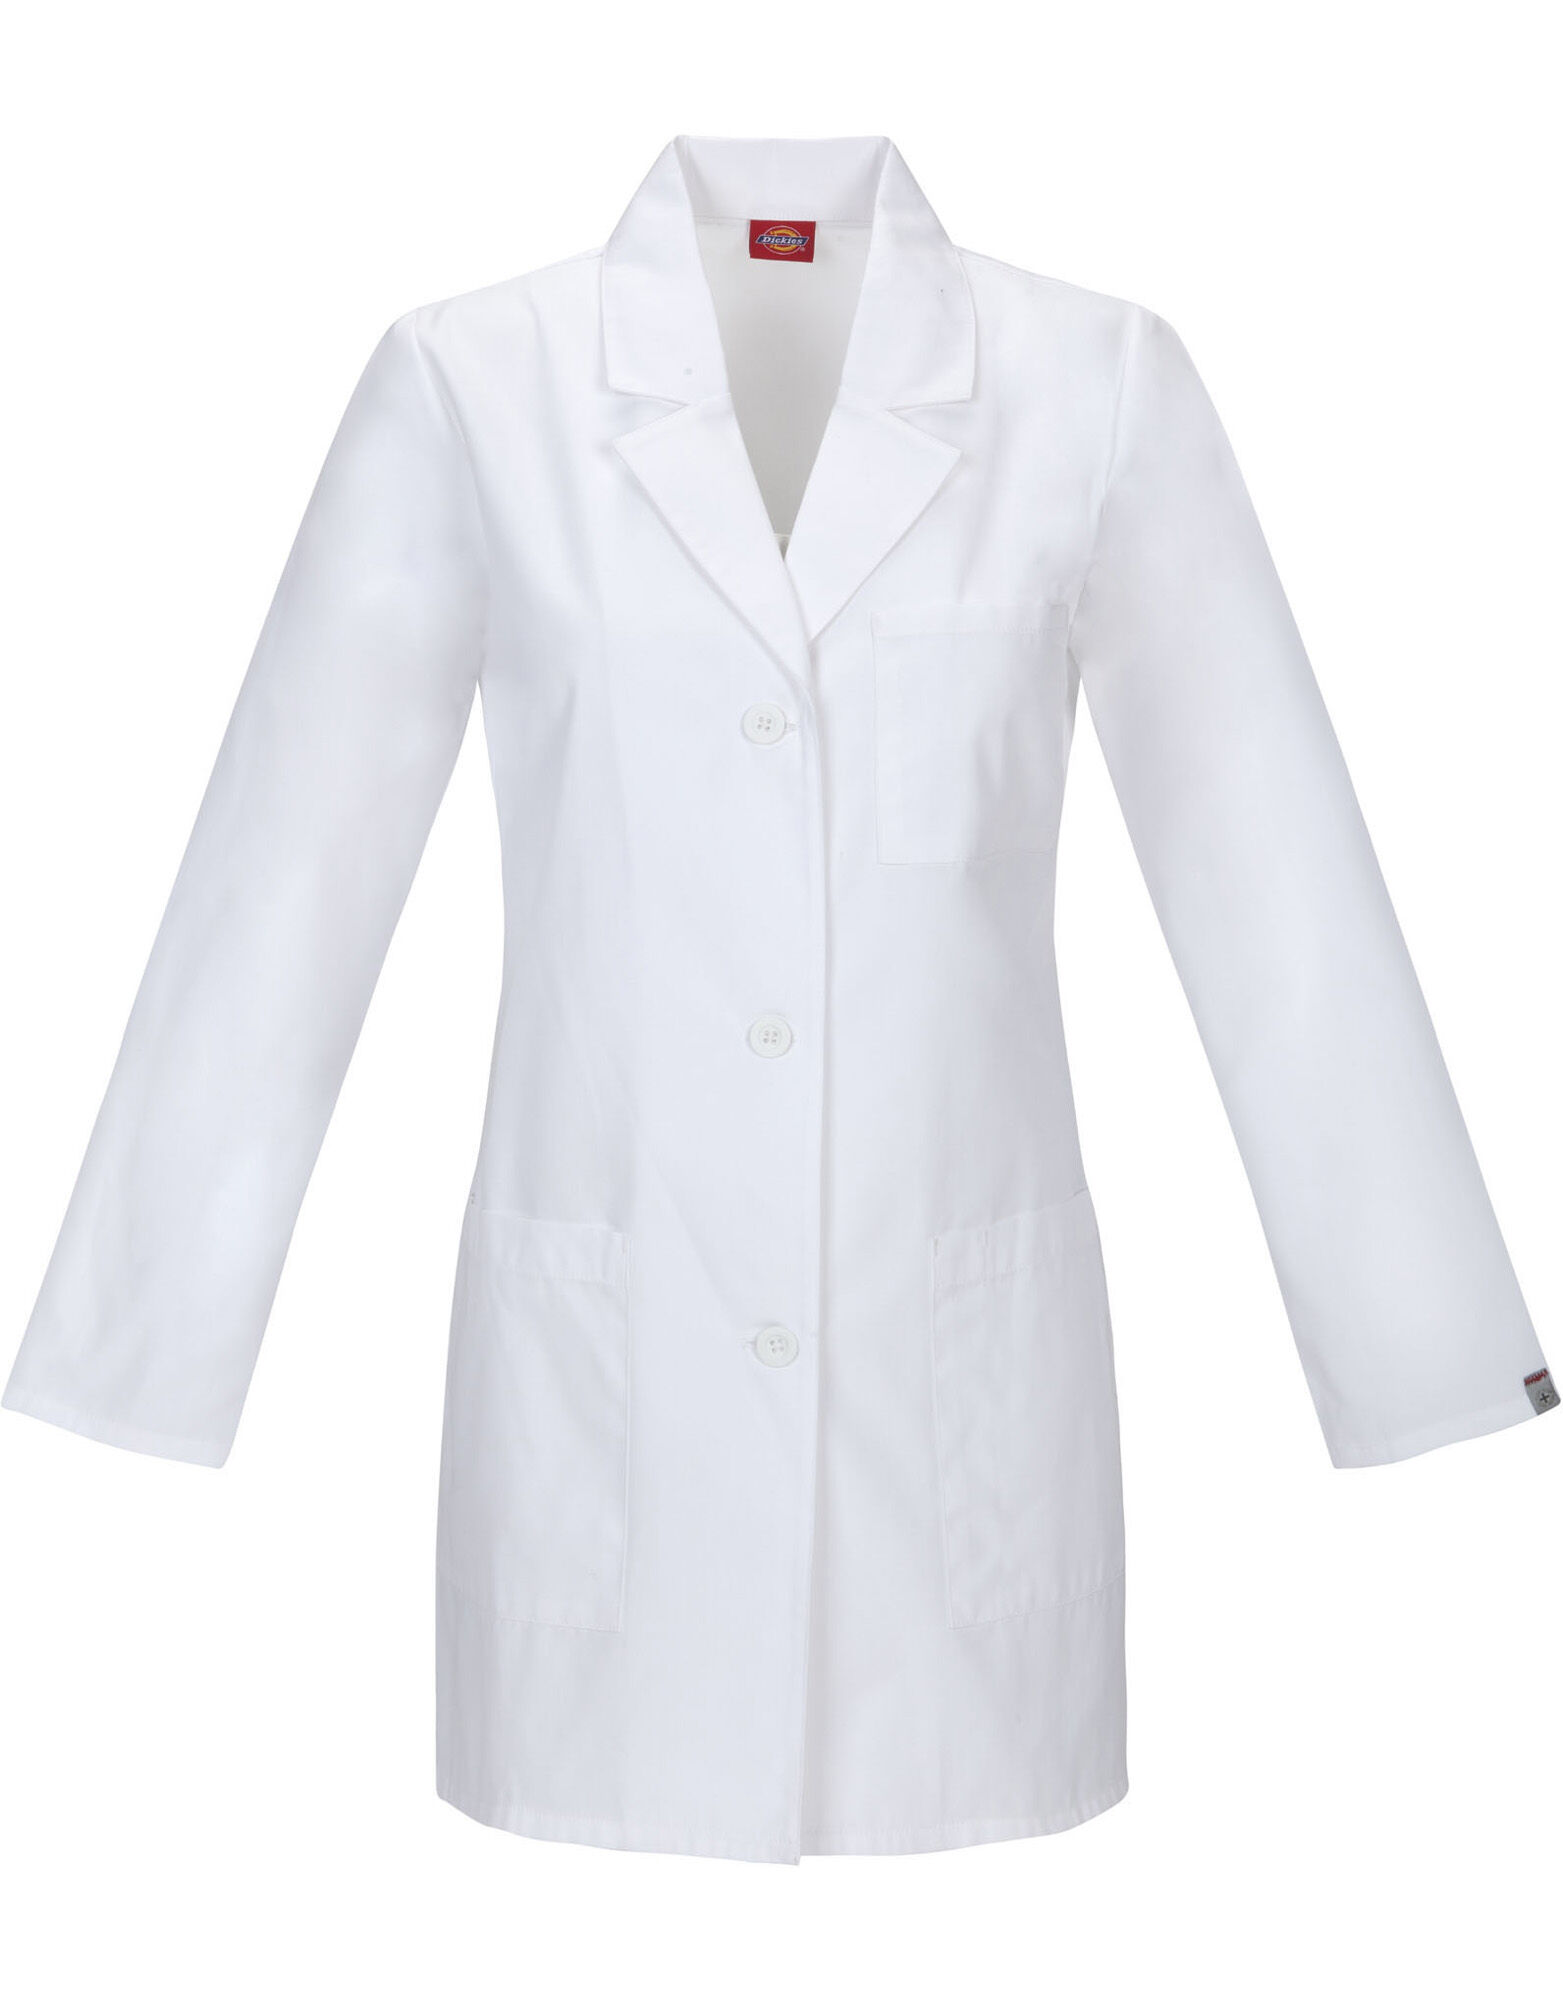 Women's EDS Signature Lab Coat | Womens Scrubs | Dickies